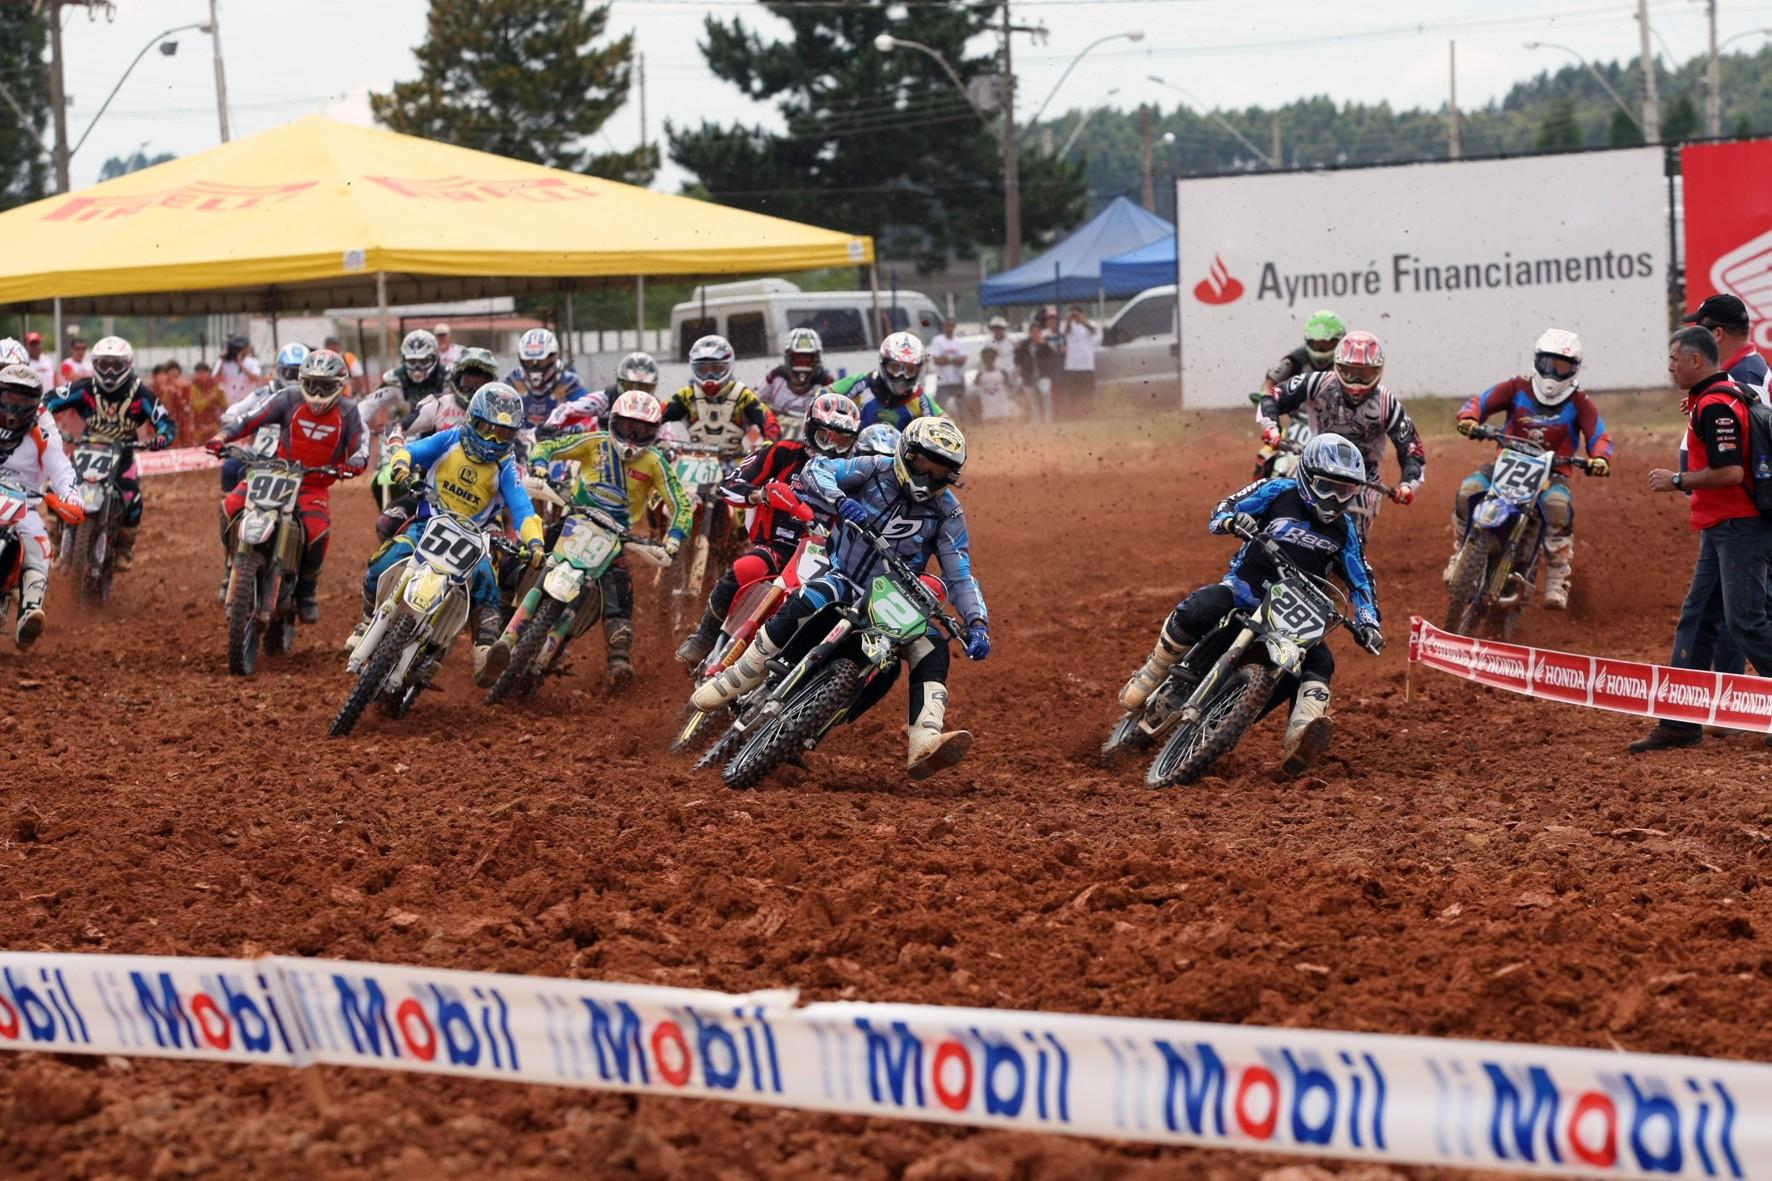 Largada da categoria MX3 da Superliga Brasil de Motocross